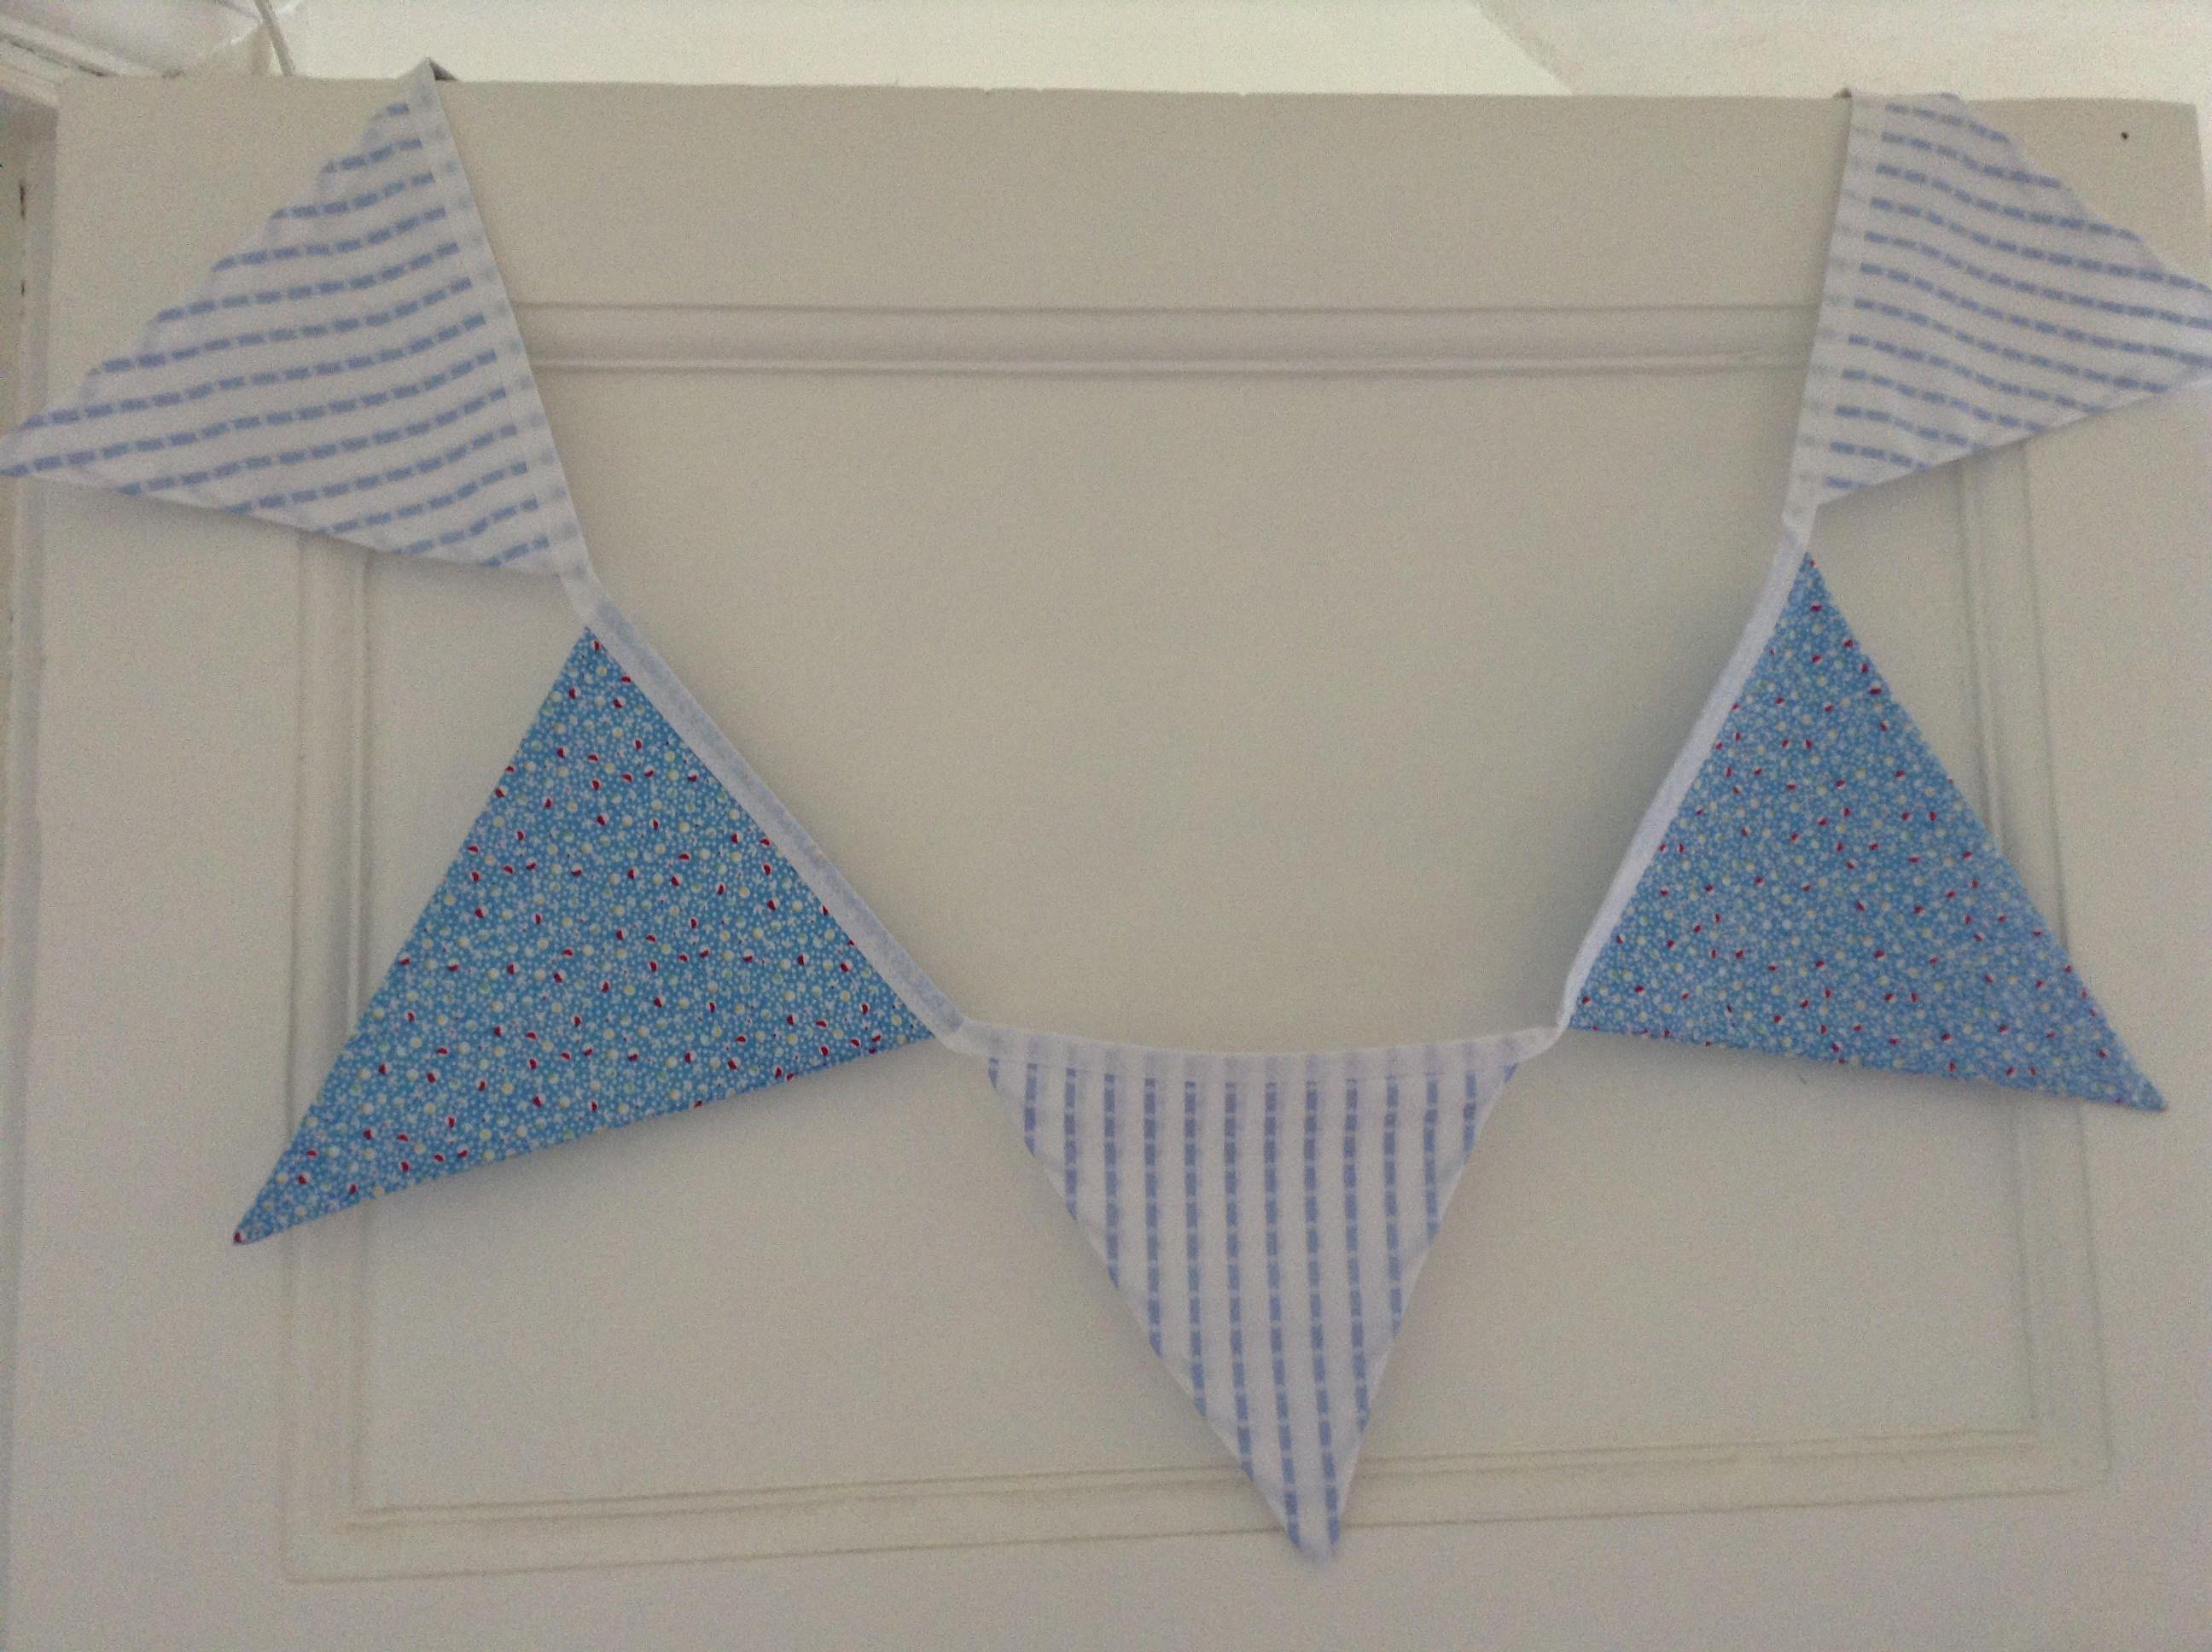 Blue nursery bunting baby shower gift garland kids bedroom decor